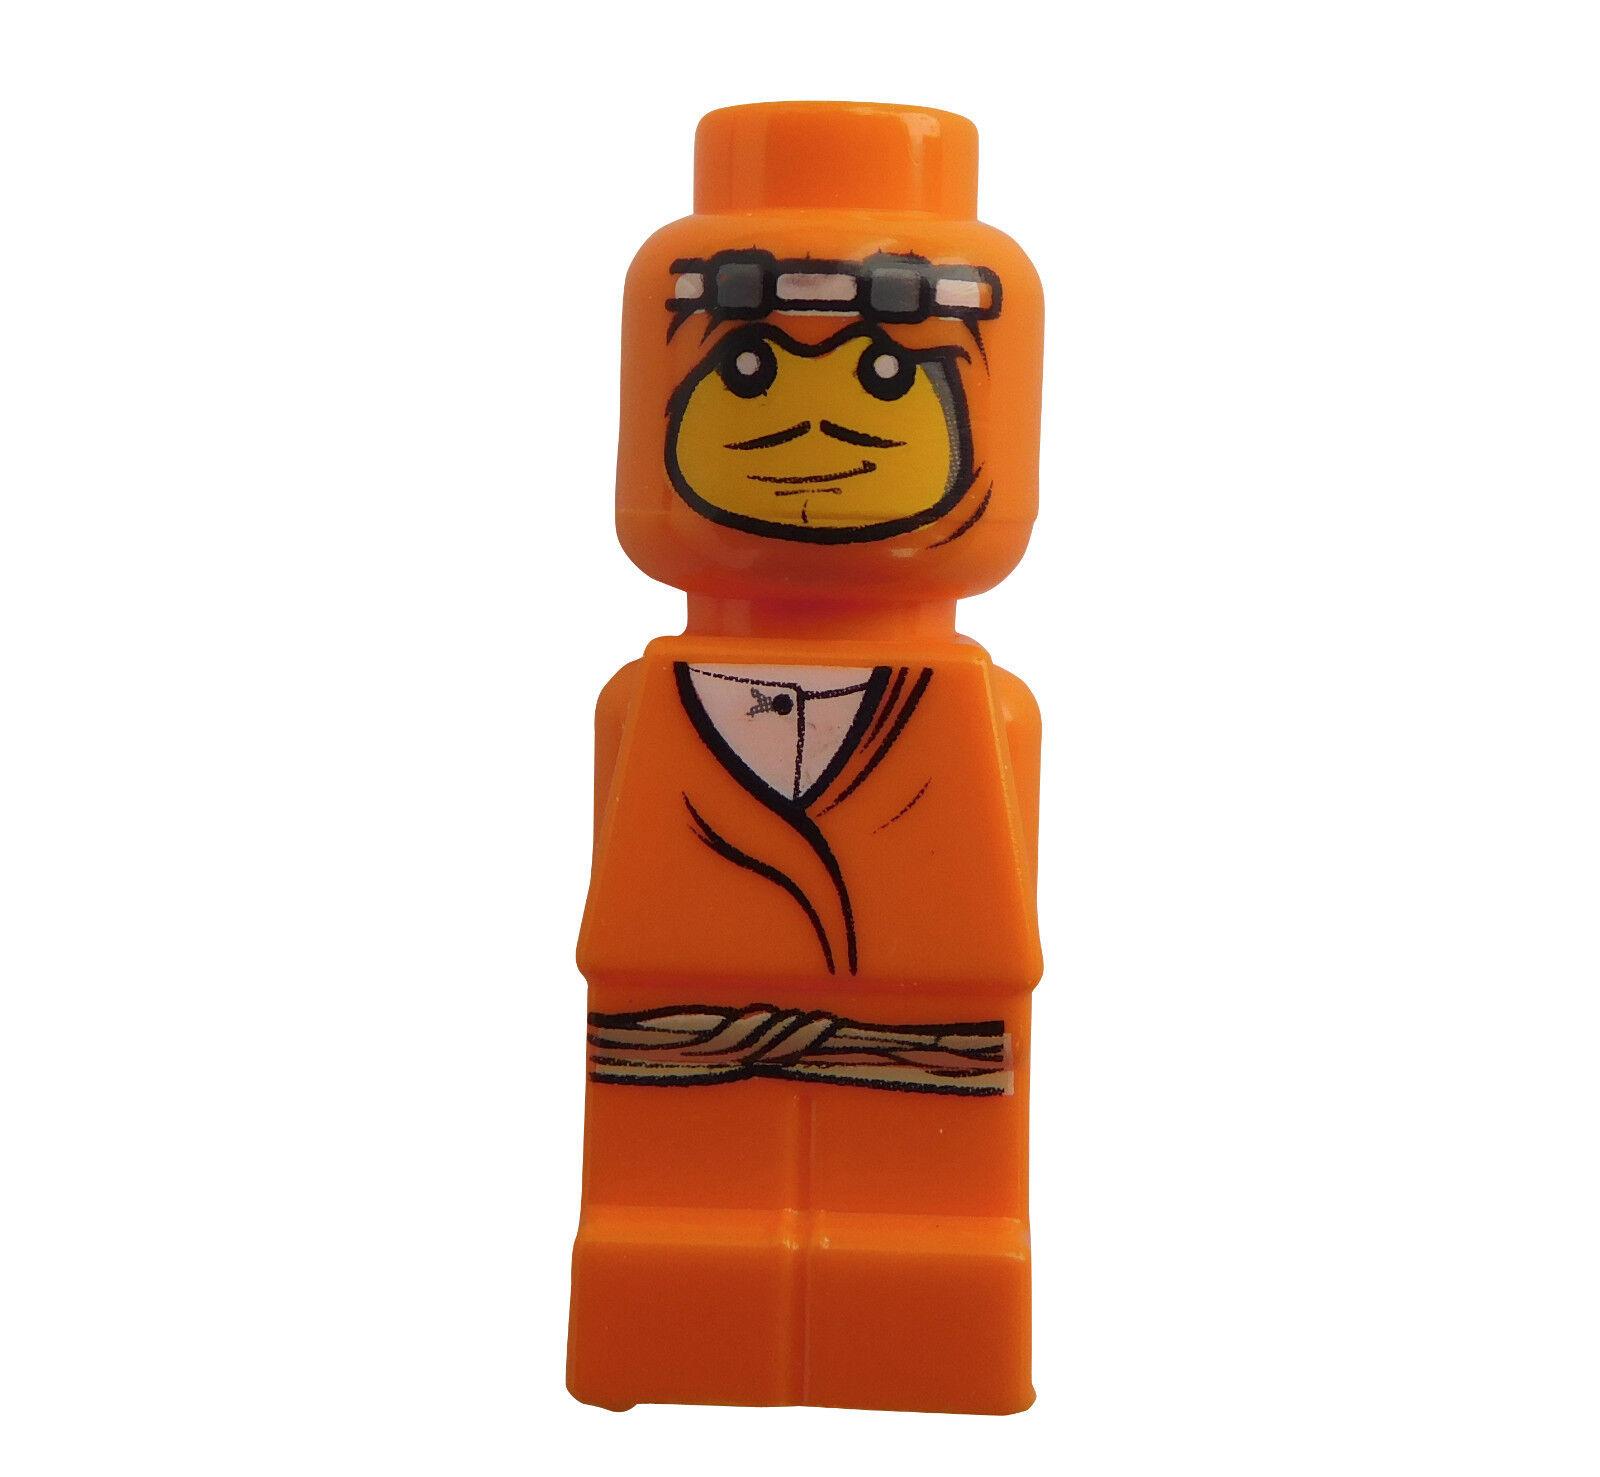 Lego 4 x Sarah Return Adventurer Orange Microfigure Basic Lot of 4 parts pieces